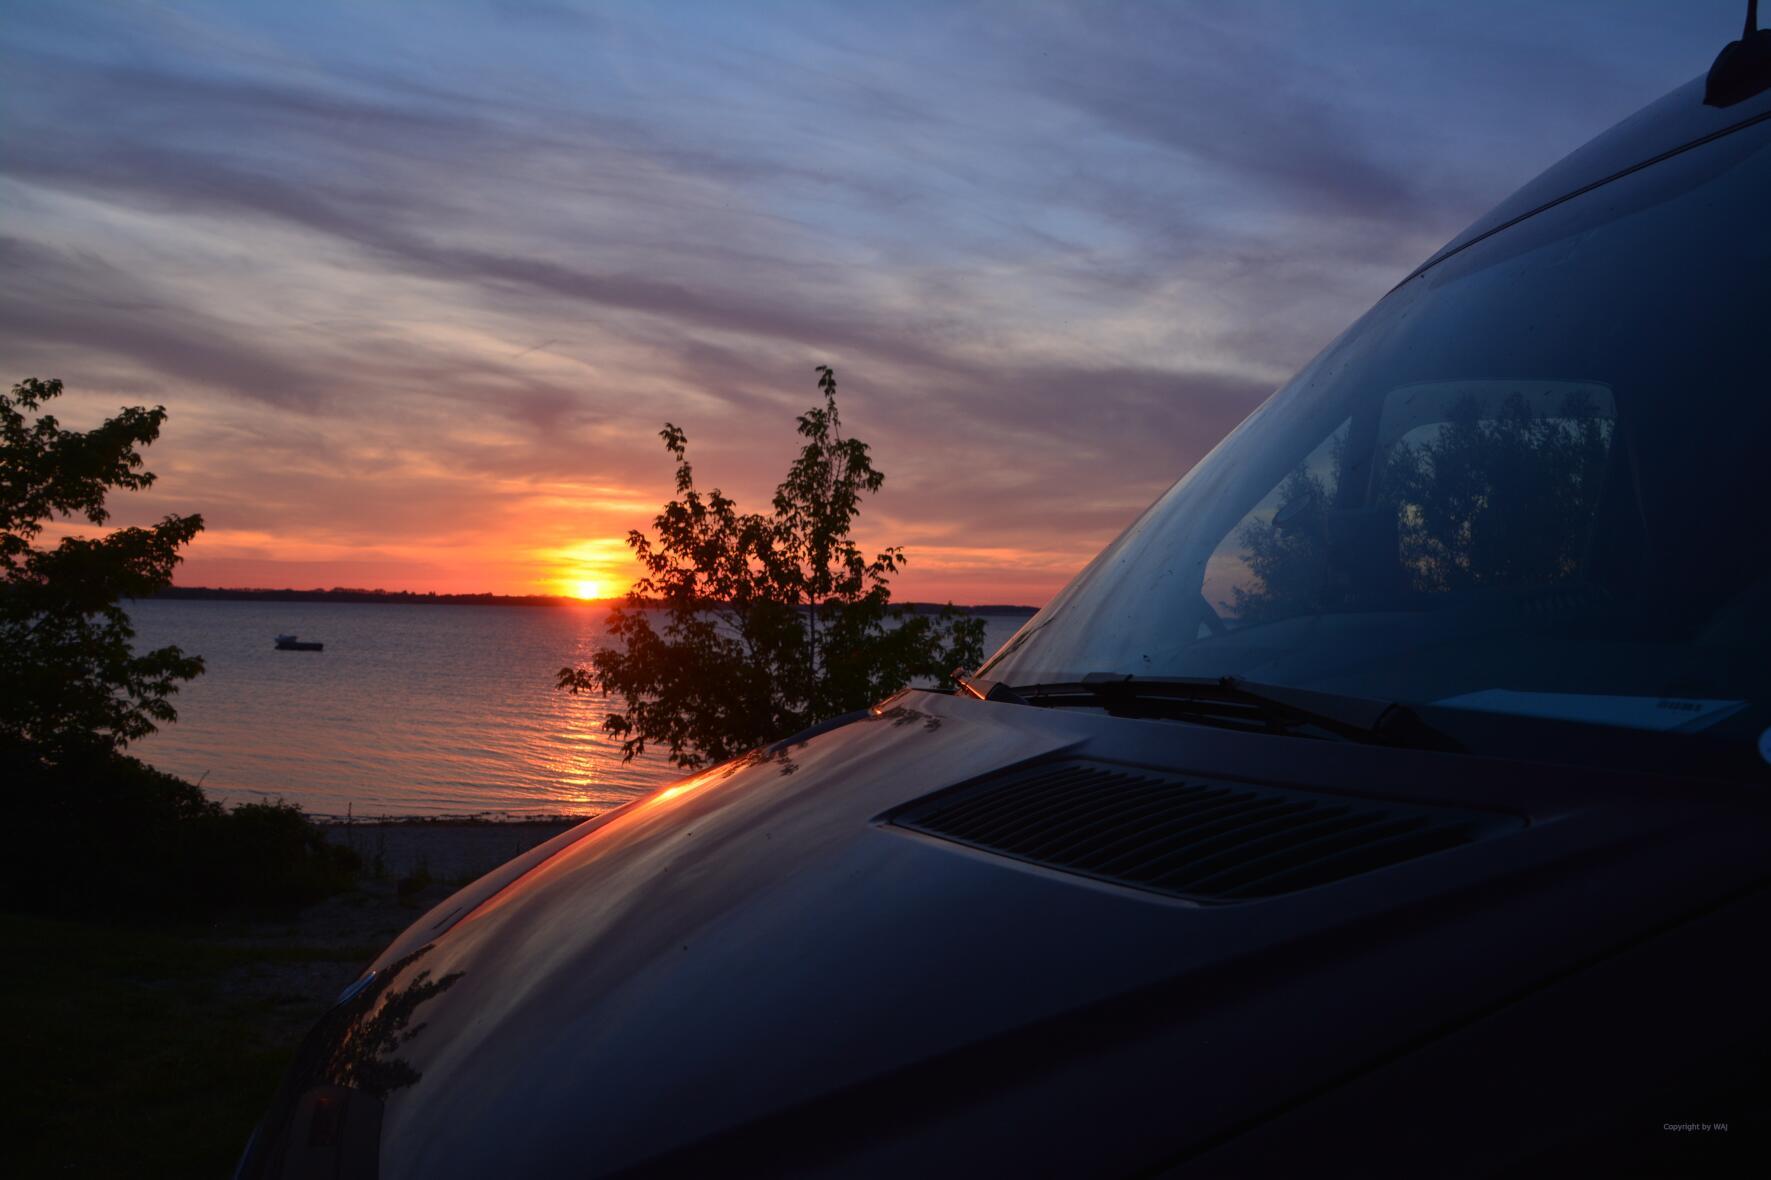 Zurück am Meer - Ostsee